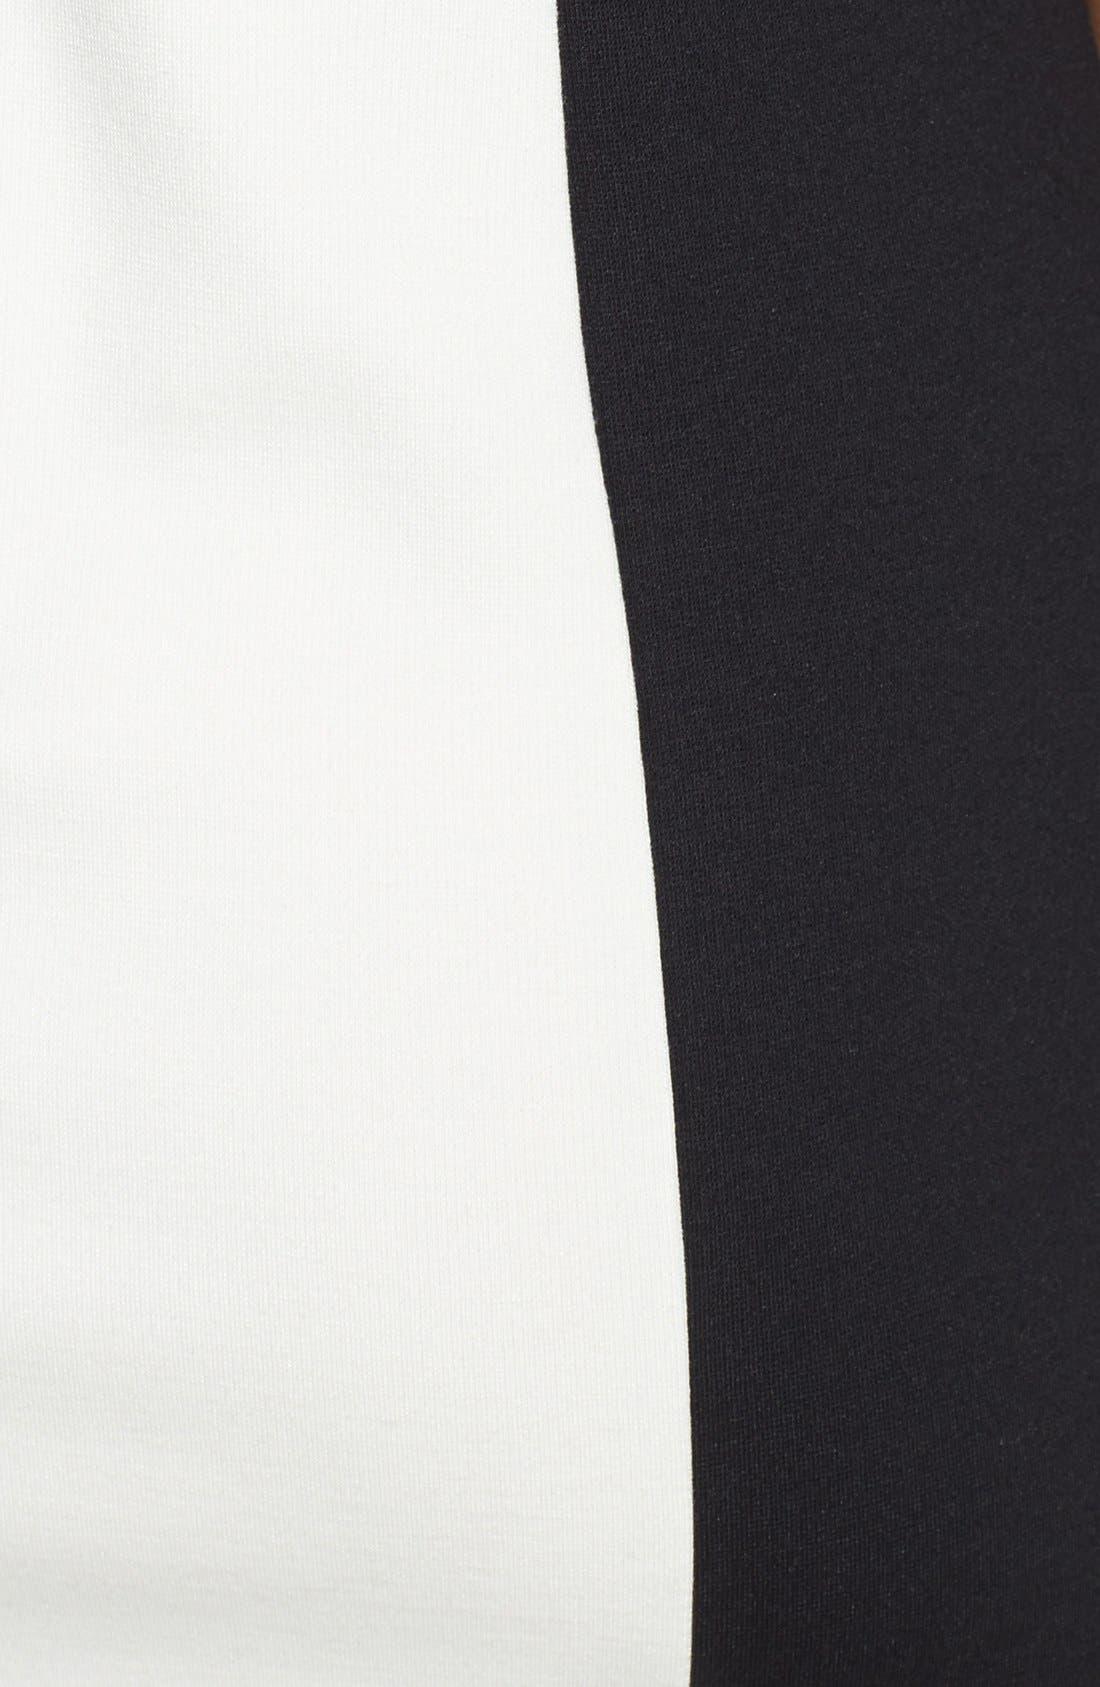 Alternate Image 3  - kensie Textured Front Ponte Knit Minidress (Online Only)